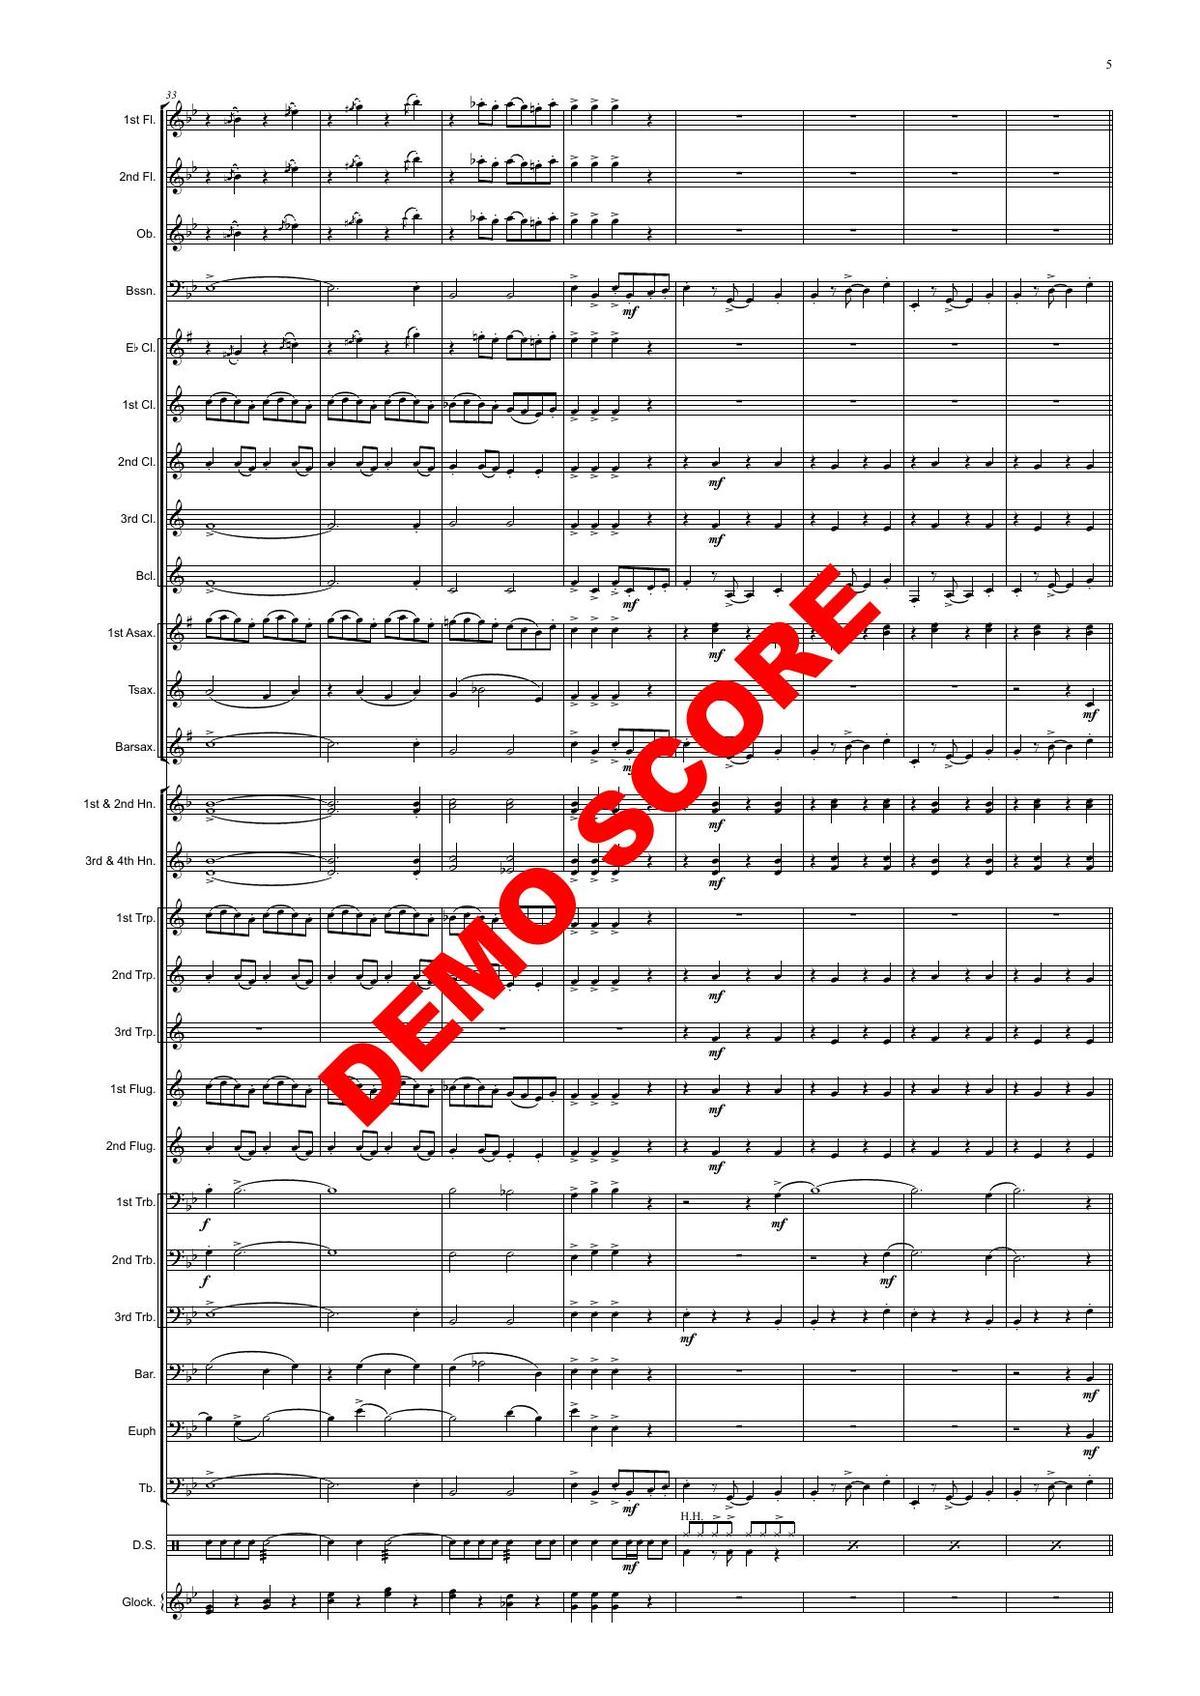 Hit factory - sheet music for flute Thomas H. Graf Germany Quartet Quintet Concert Band, Big band,